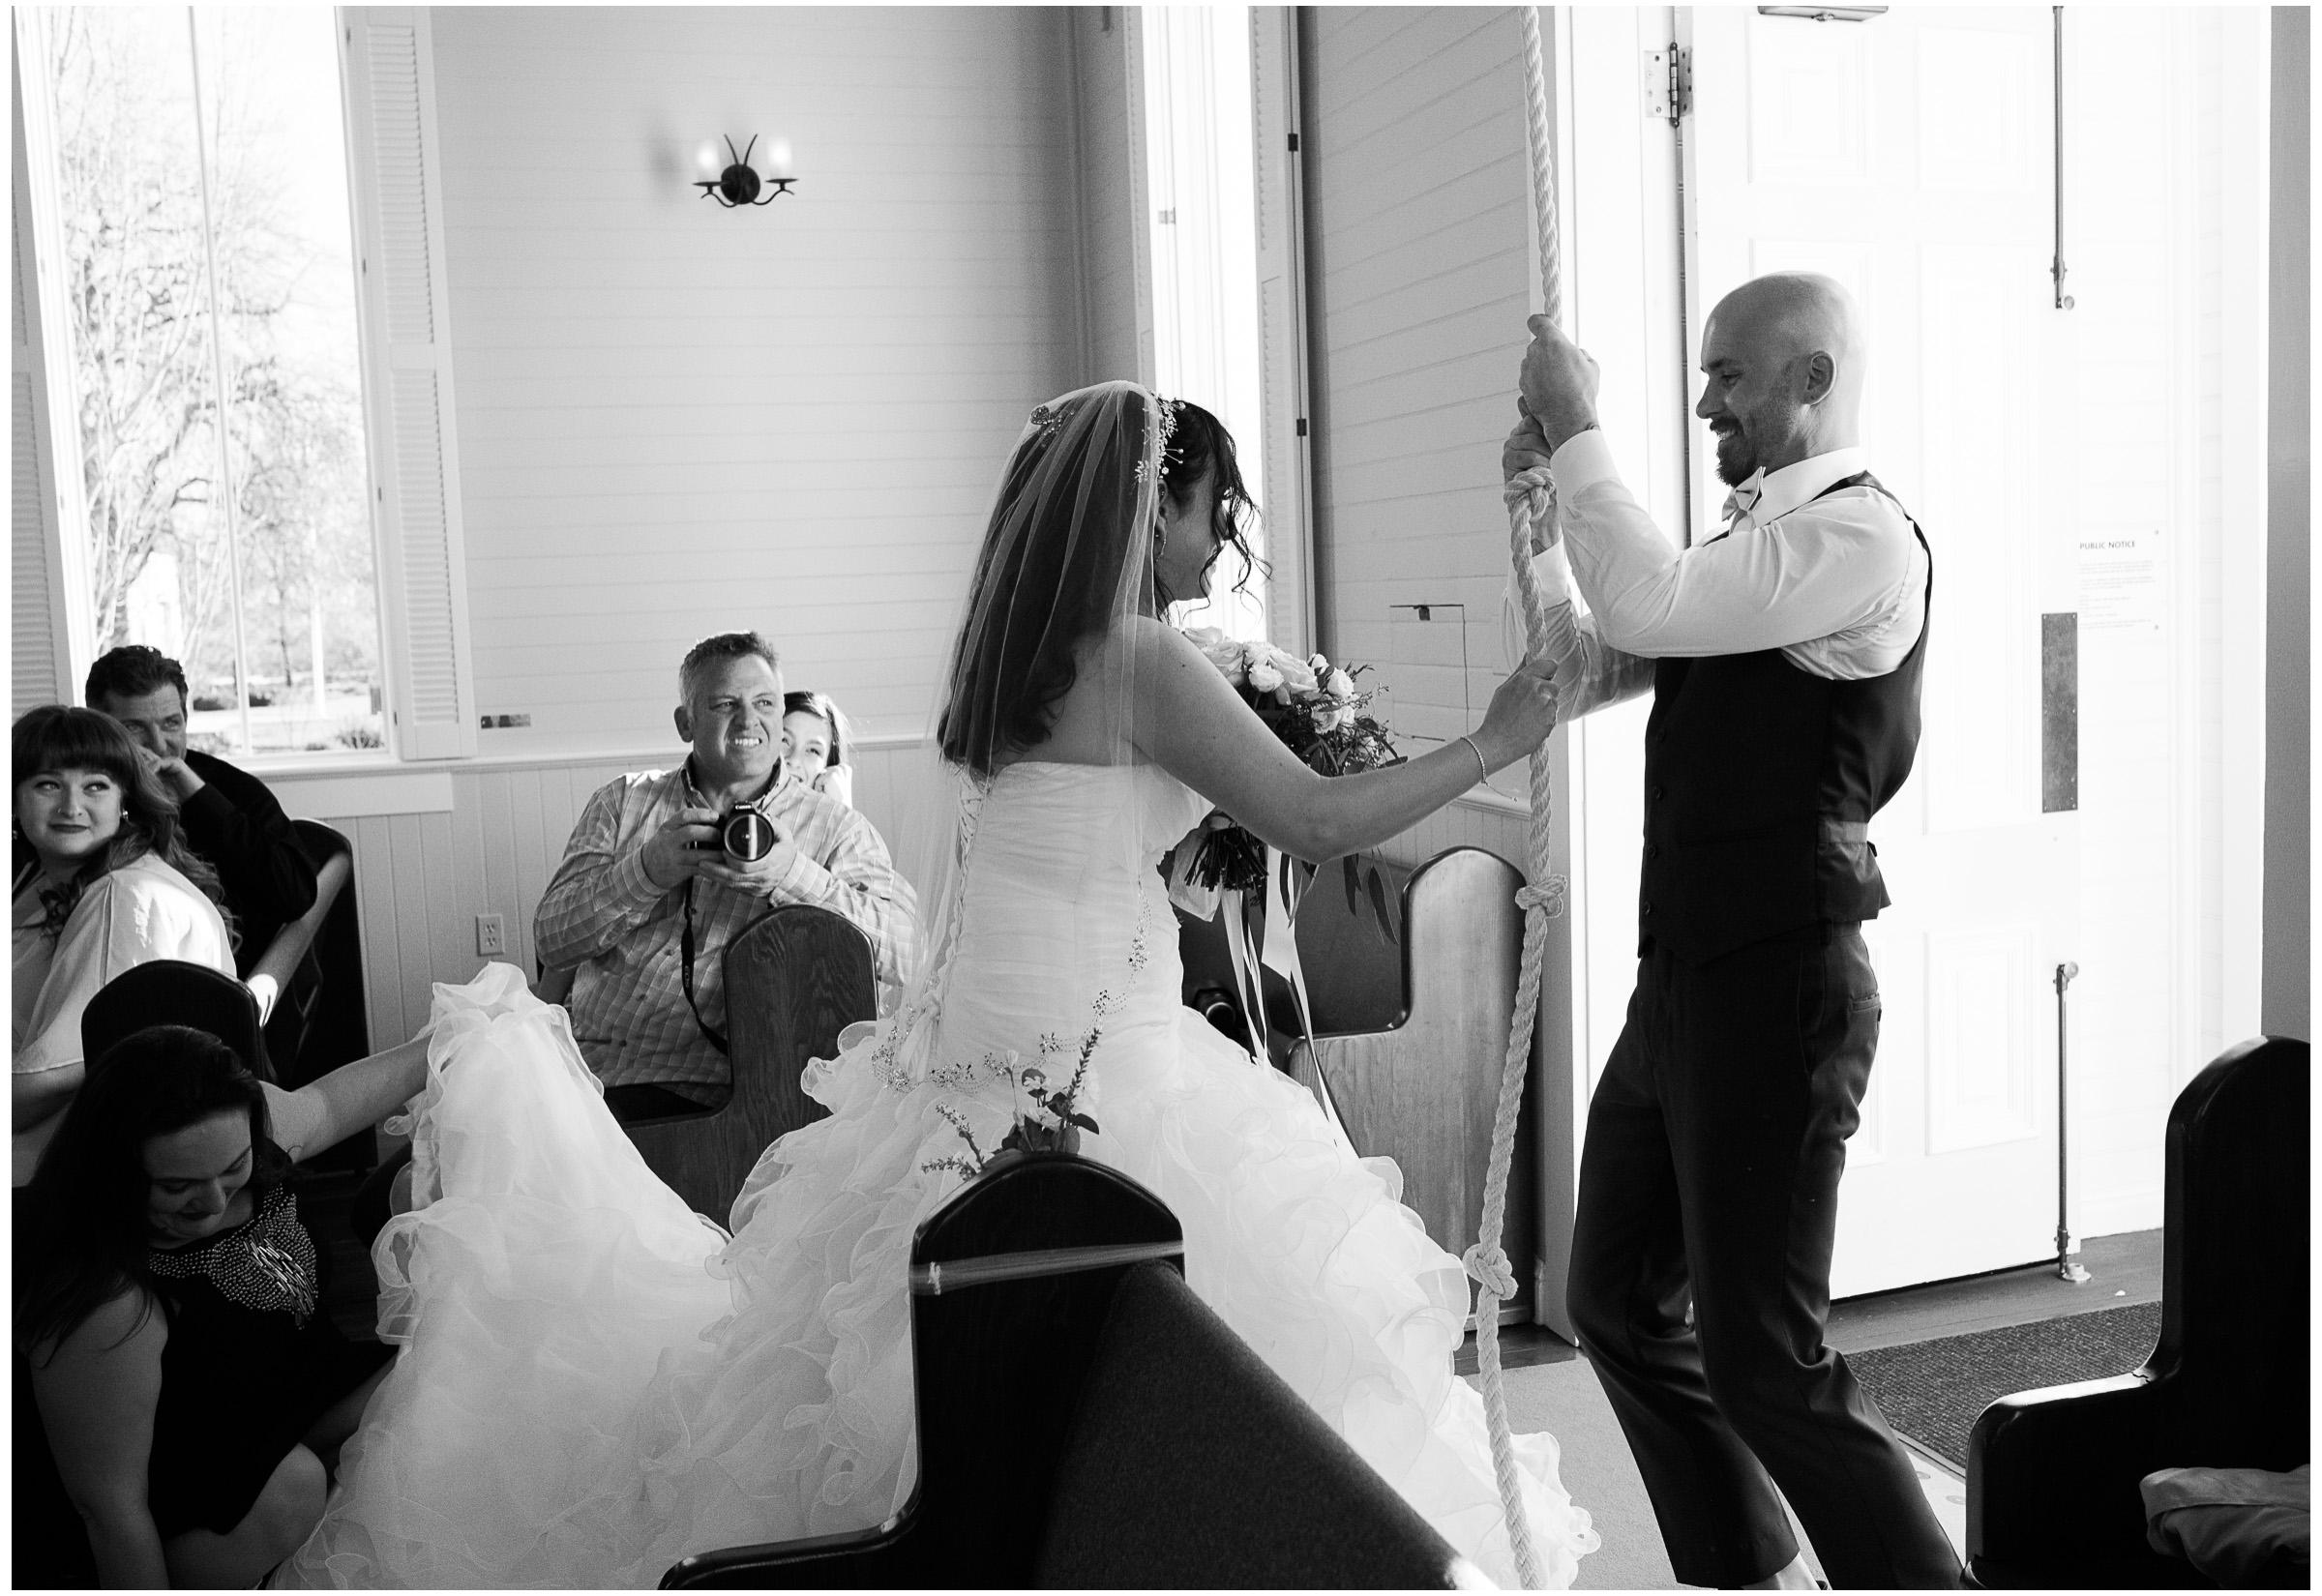 Sacramento Wedding - Sacramento Photographer - Justin Wilcox Photography - 16.jpg